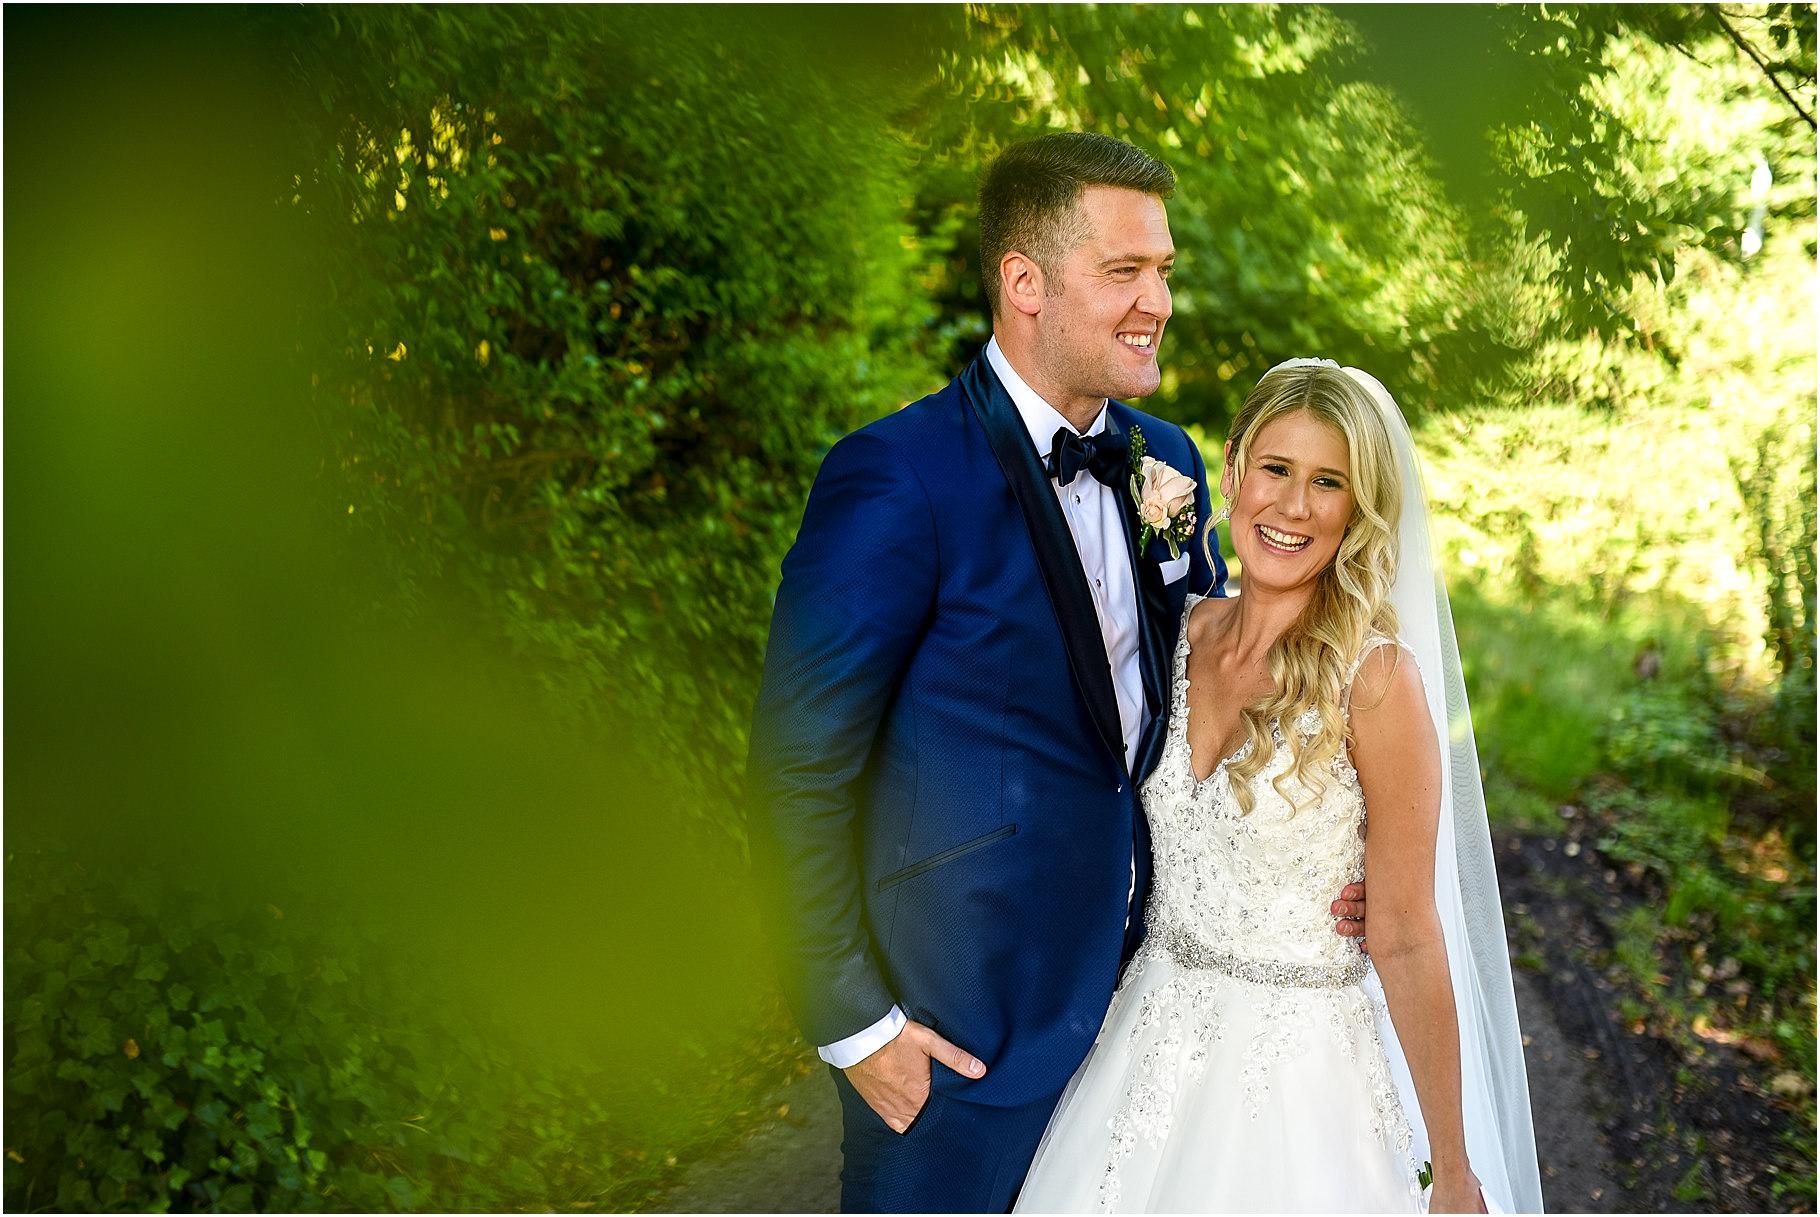 the-villa-wrea-green-wedding-31.jpg